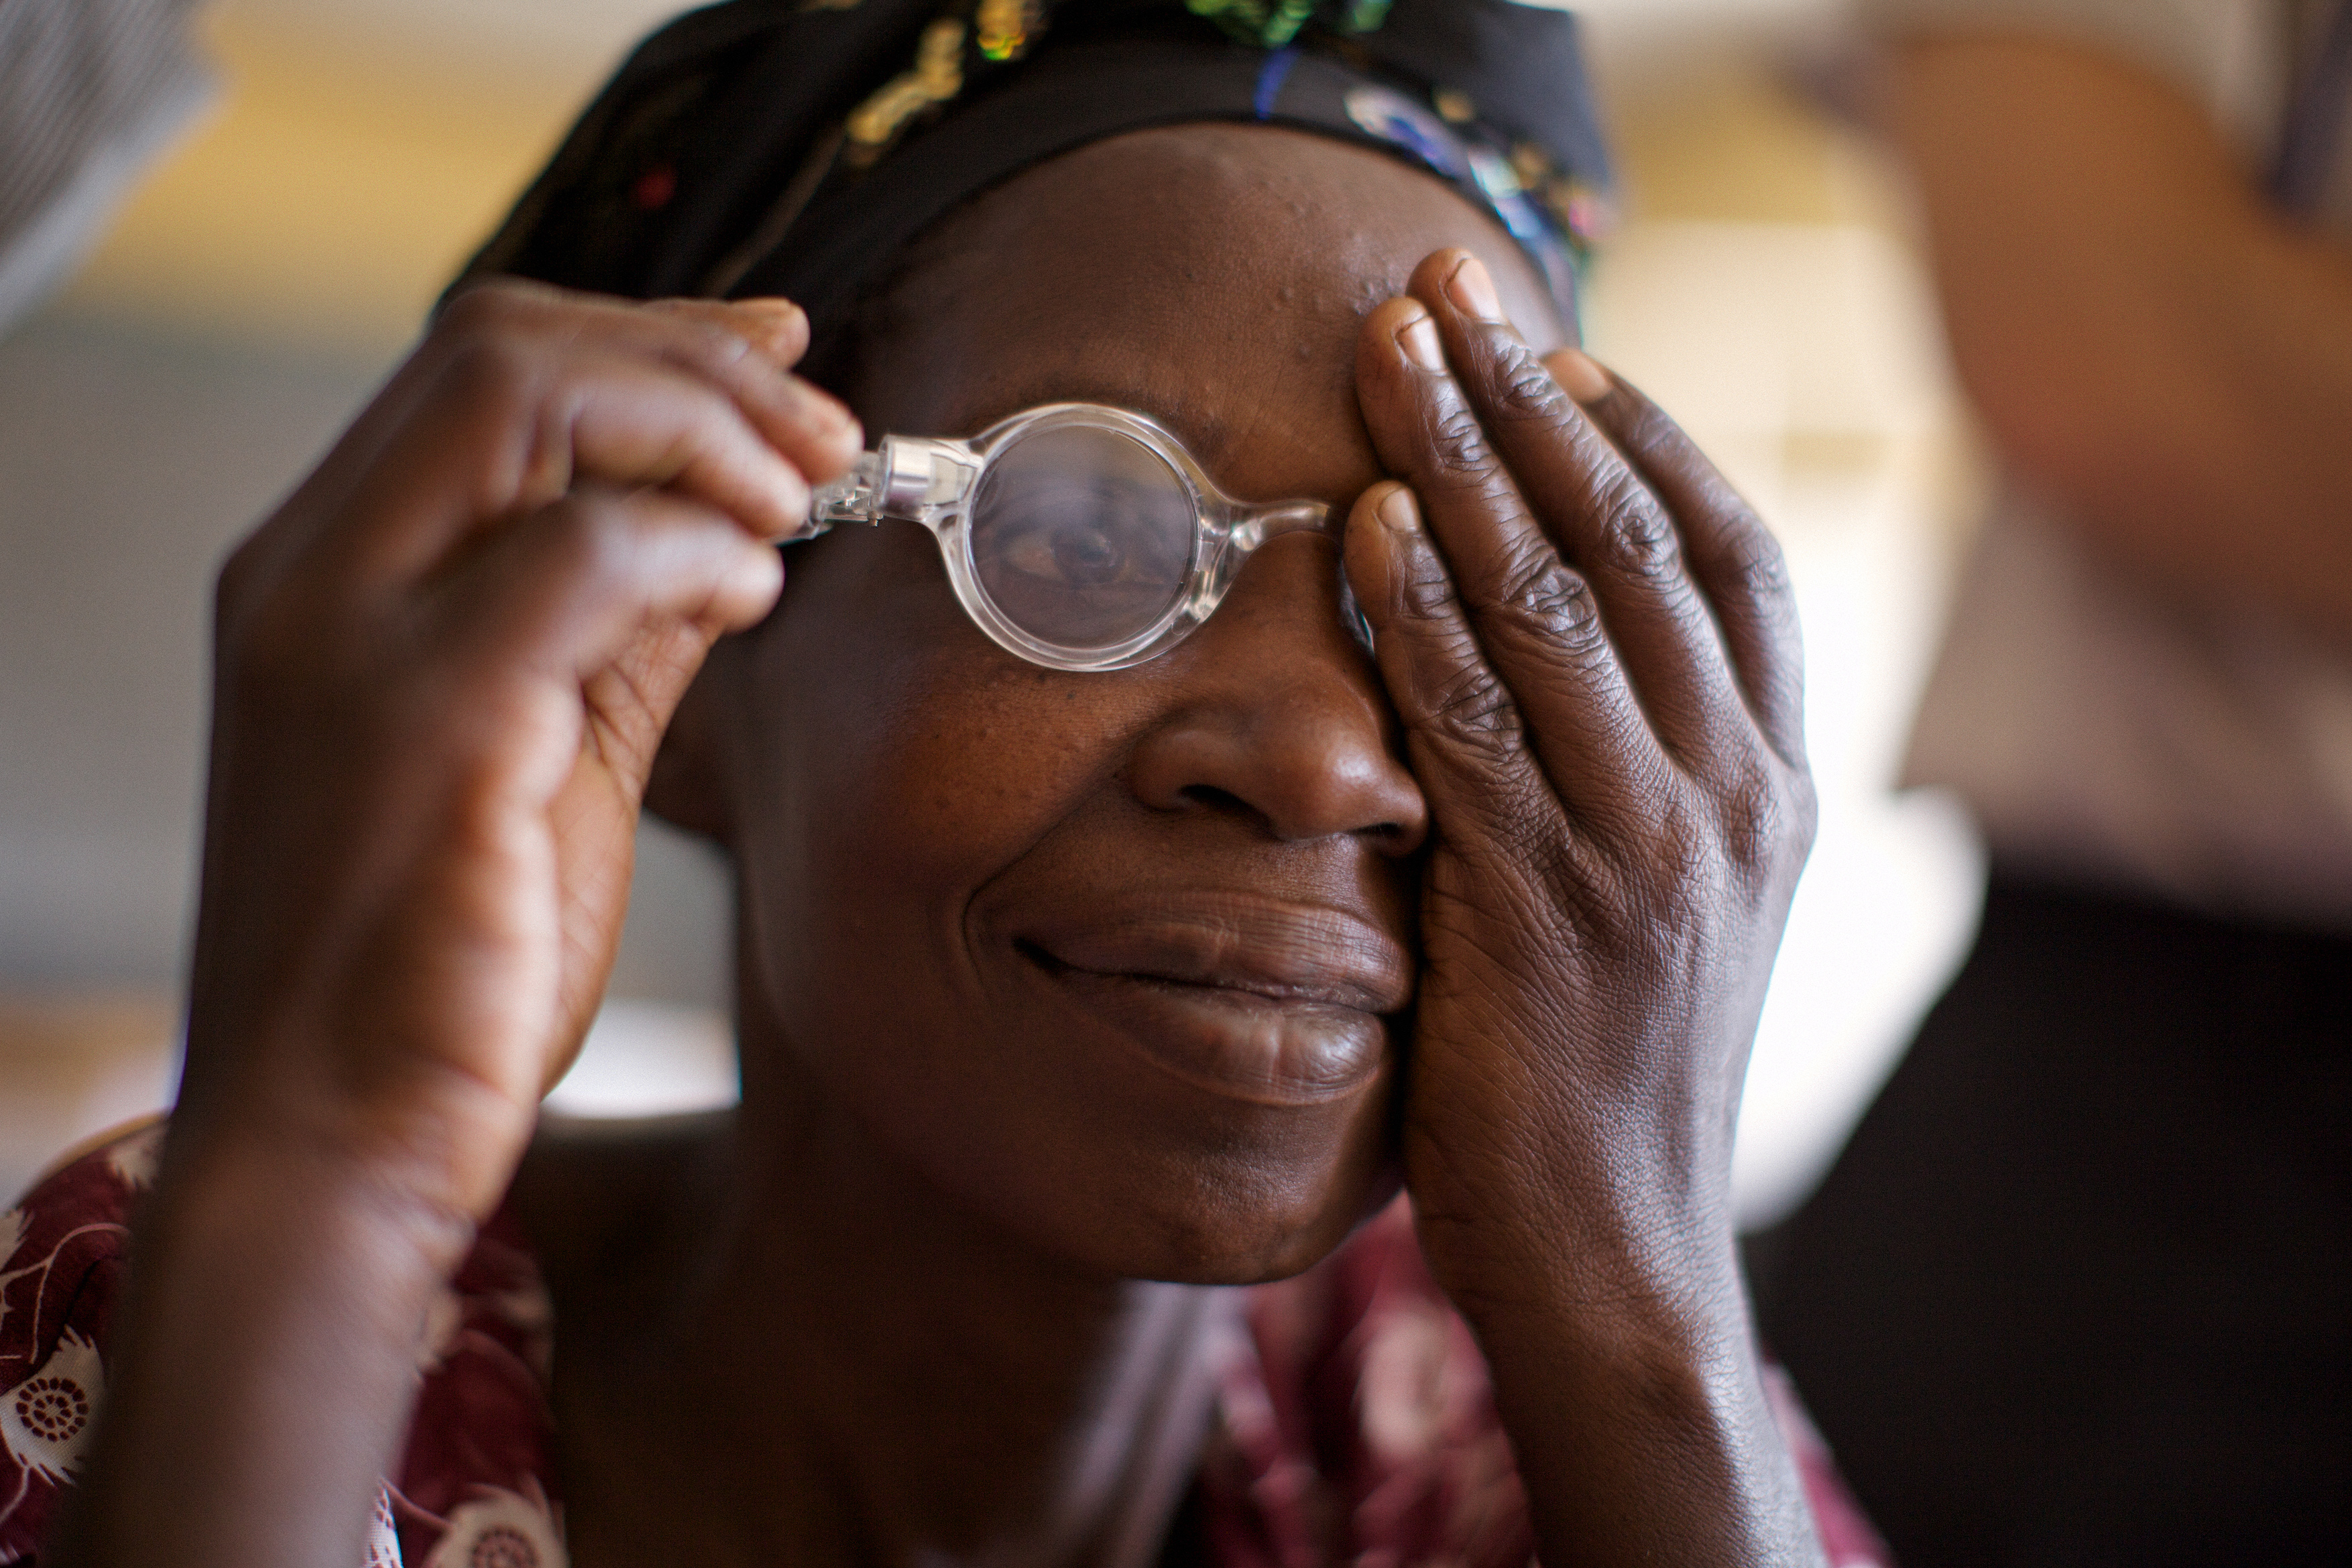 adlens et son programme buy one give one au Rwanda